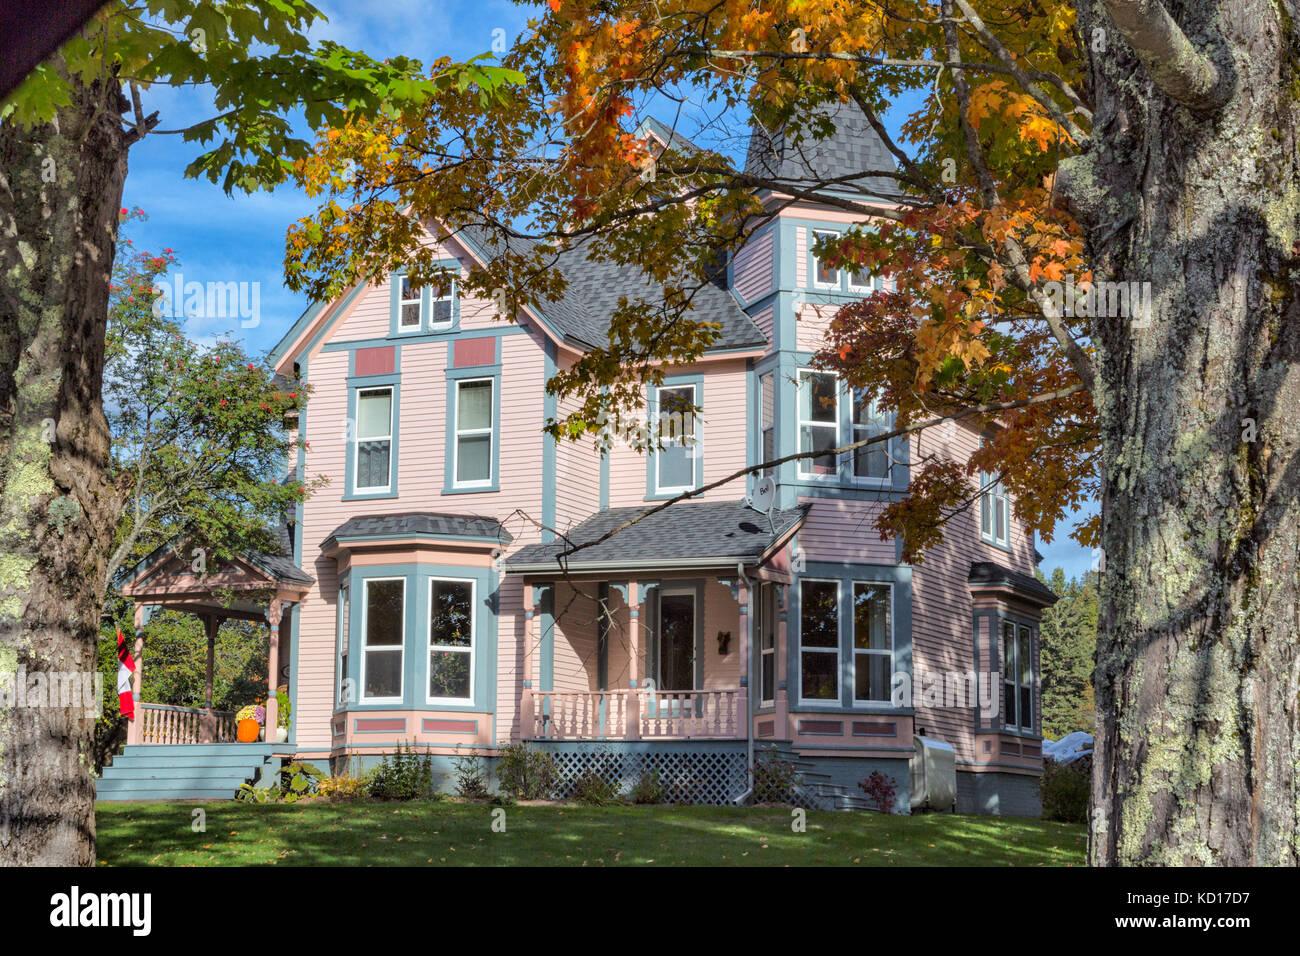 Inn, St. Martins, New Brunswick, Canada - Stock Image